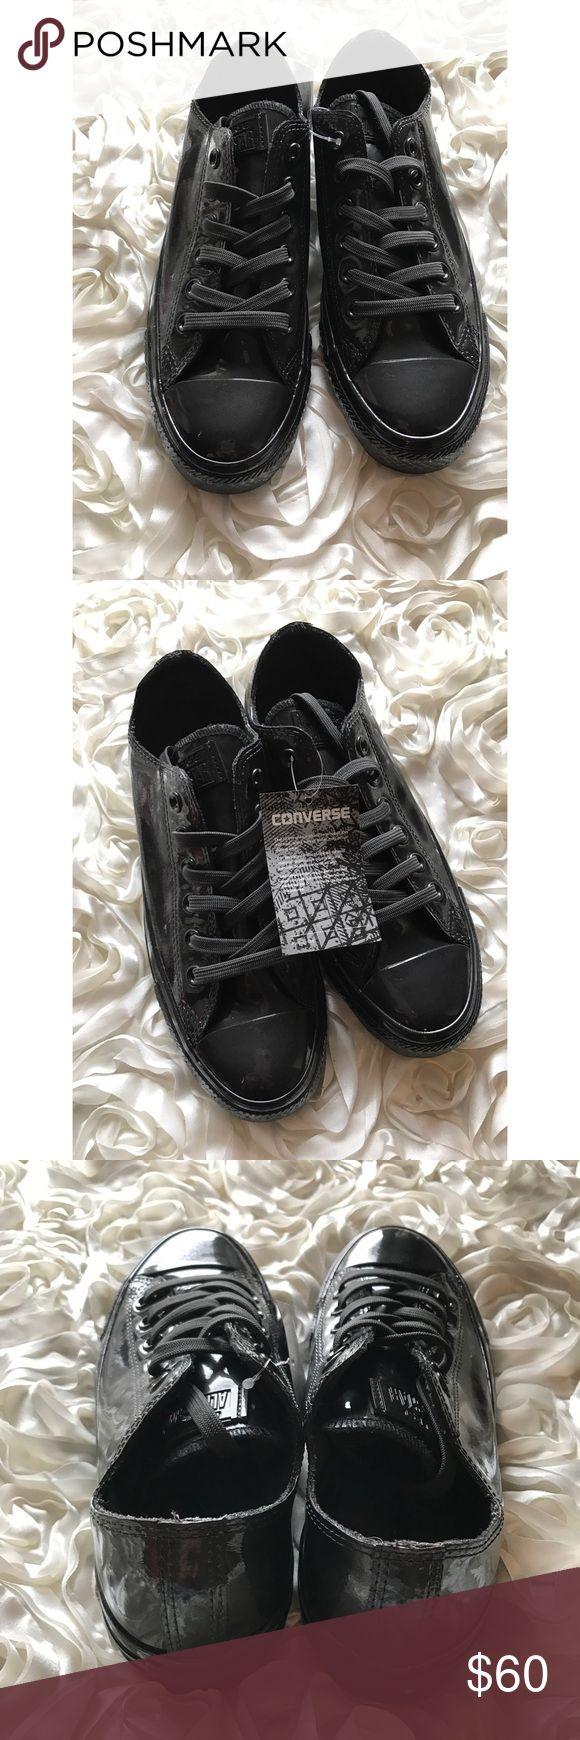 Black Converse All black shiny converse. Converse Shoes Sneakers